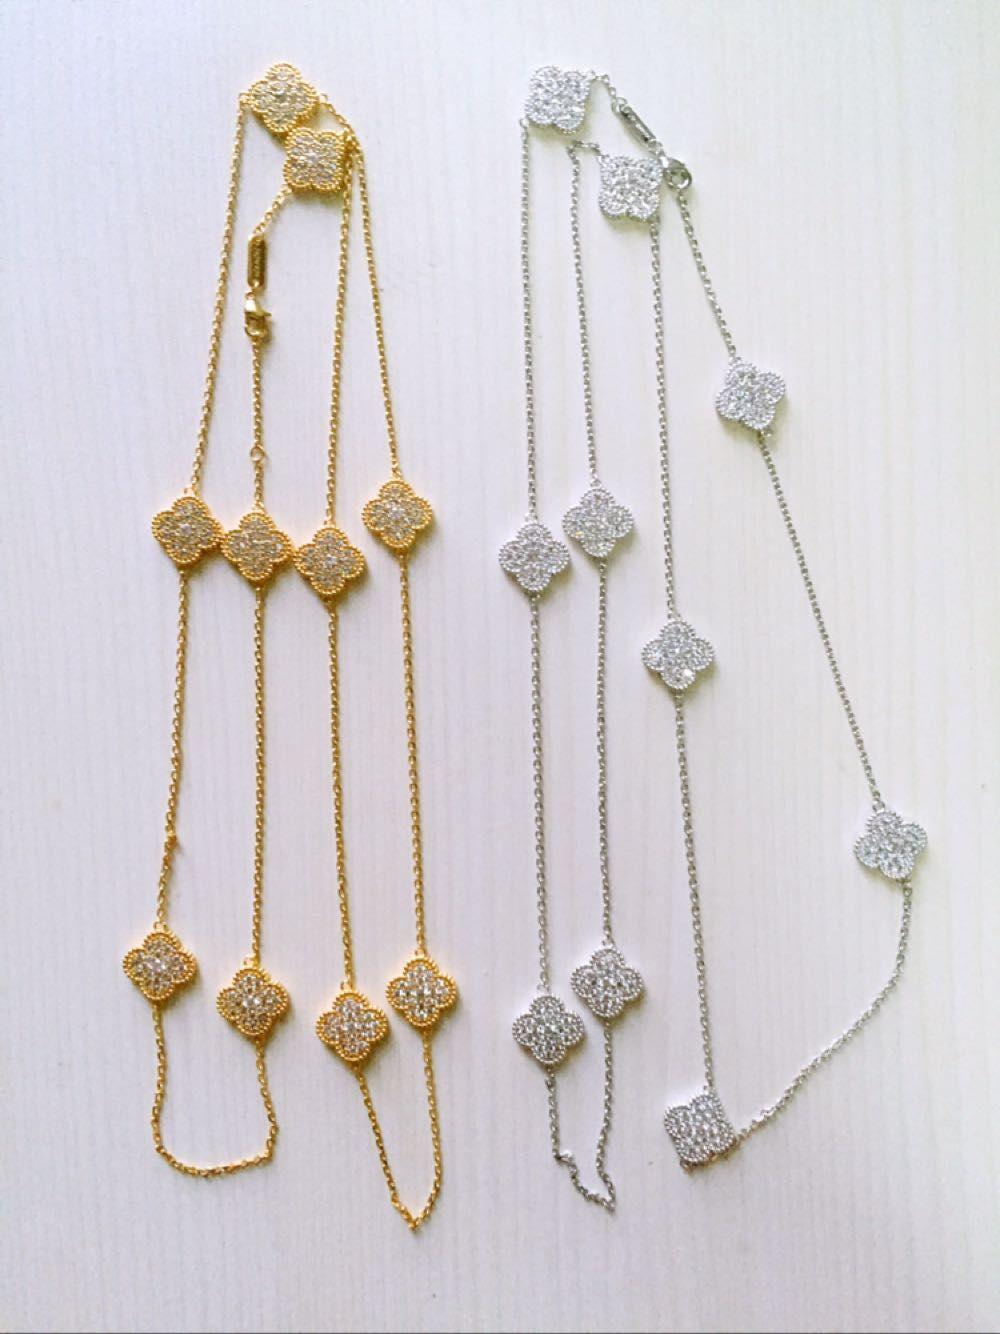 Four leaf clover necklace for women full crystal gem long ten flower